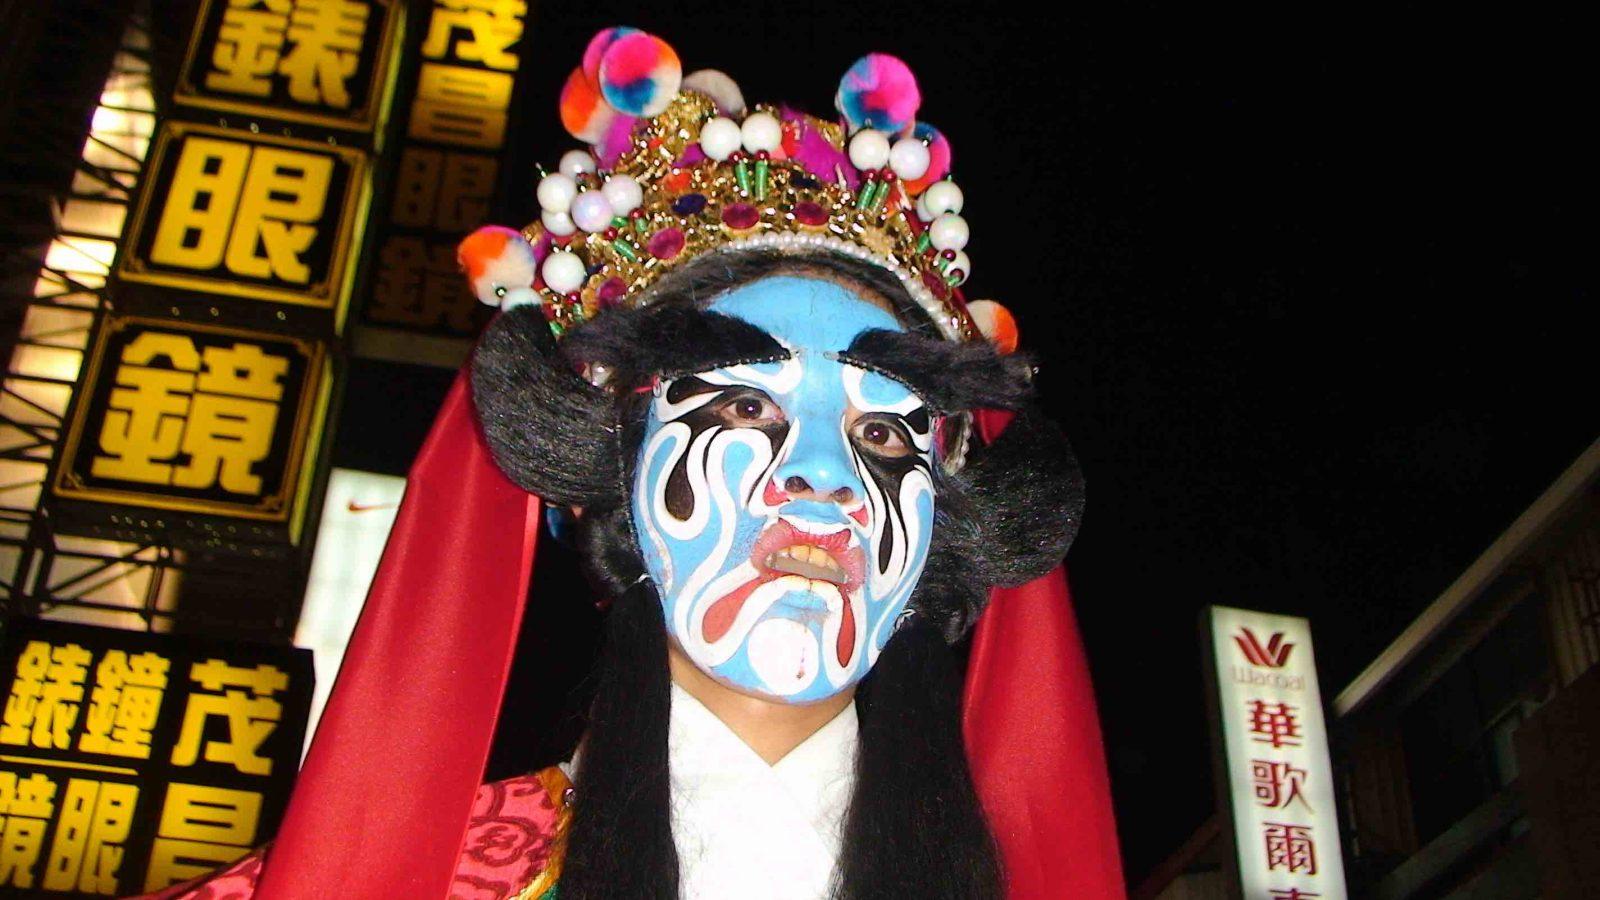 wagaligong-surf-hostel-dulan-lantern-festival-e1465020205620